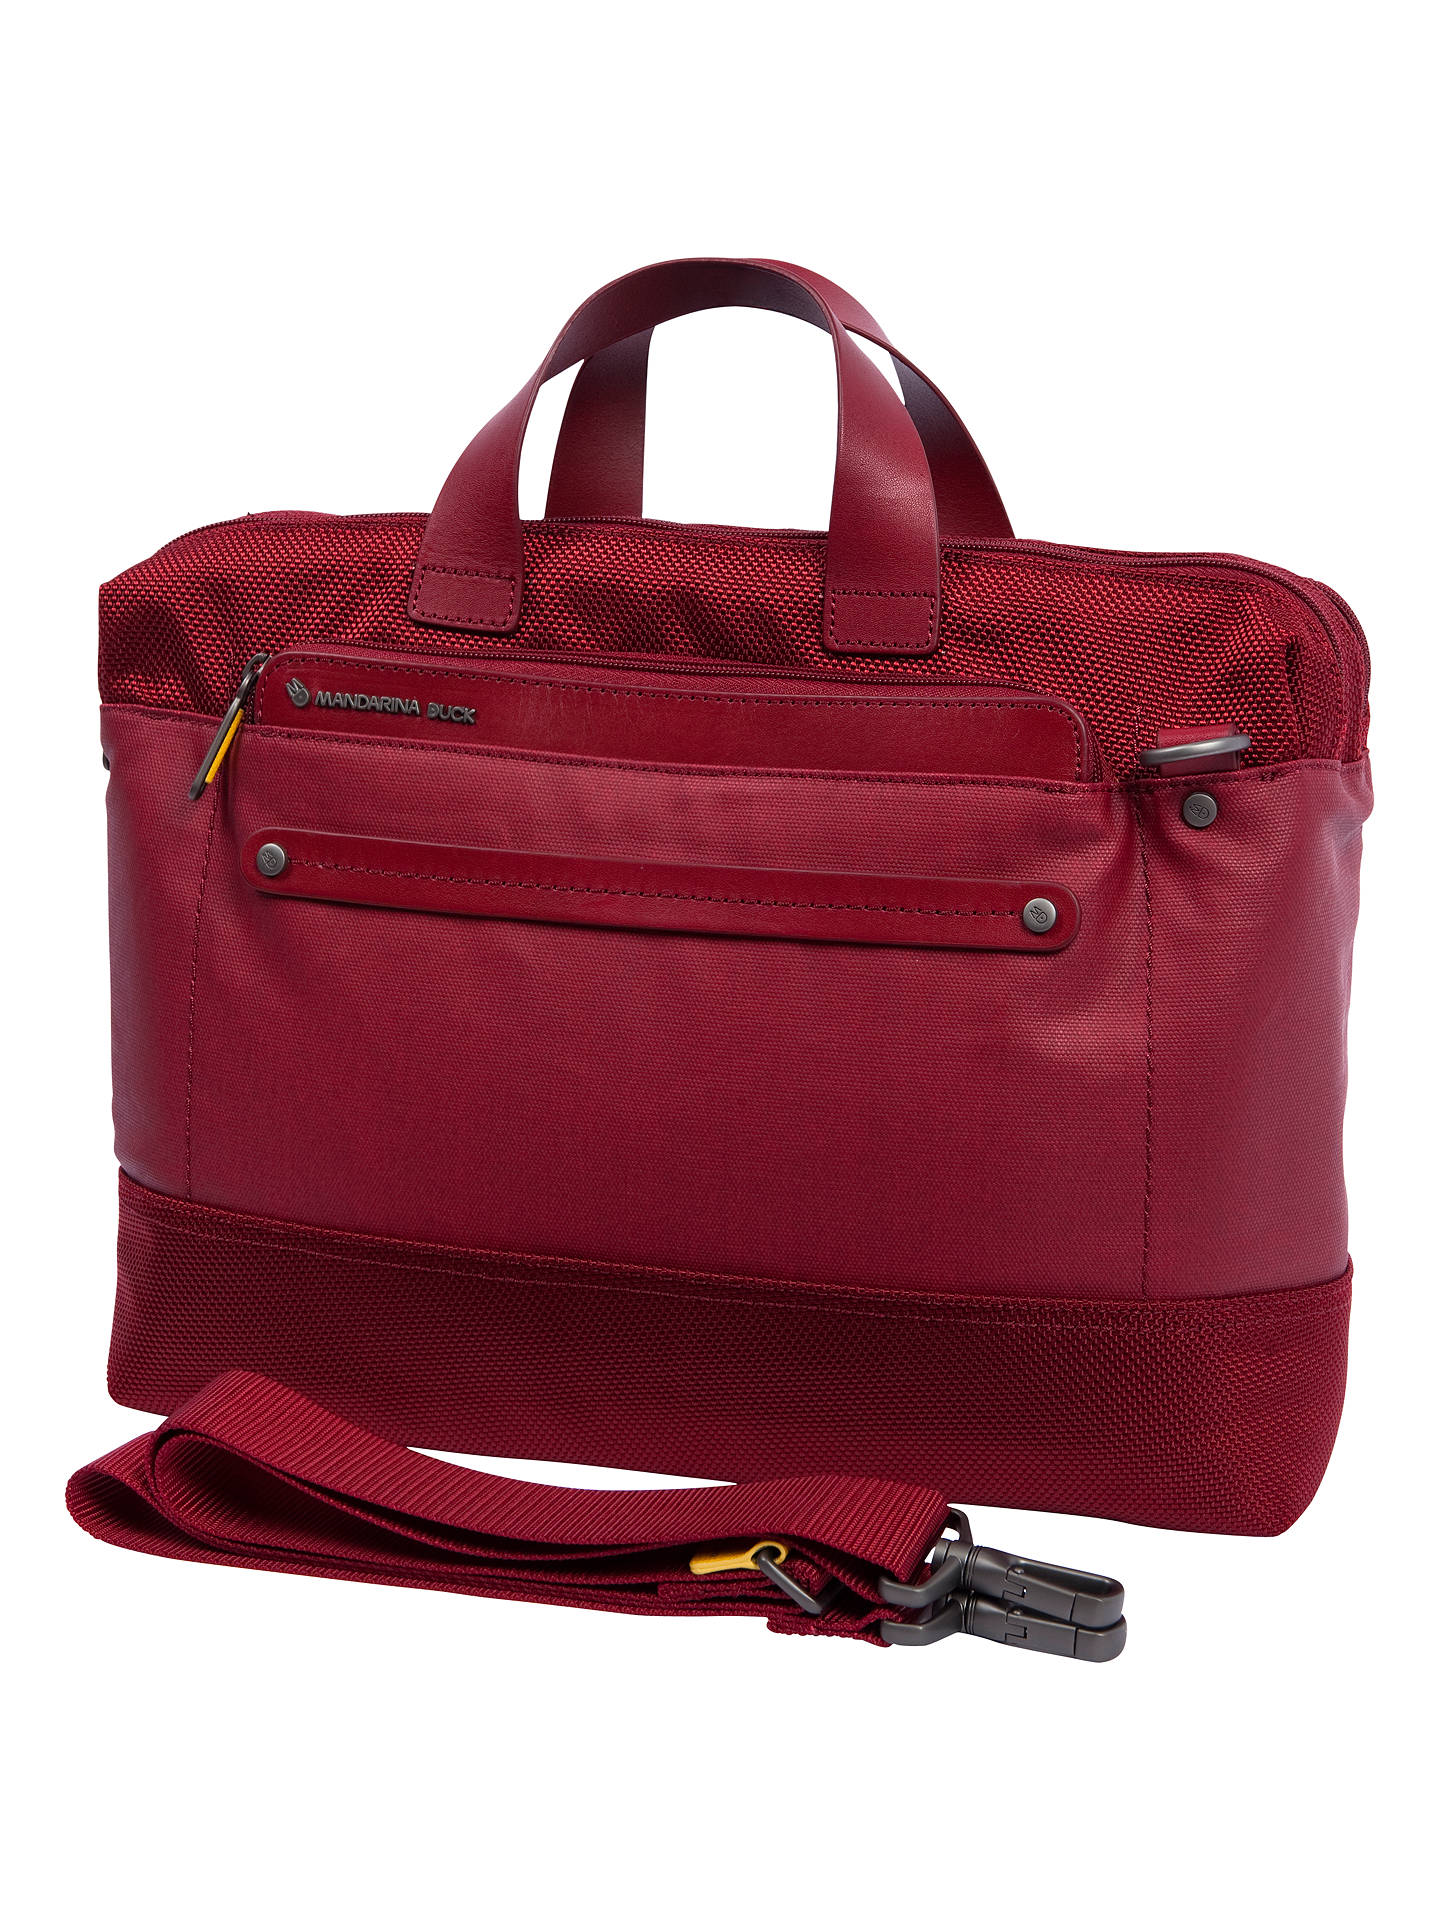 Mandarina duck cabrio 13 3 laptop and tablet briefcase red medium at john lewis partners - Mandarina home online ...